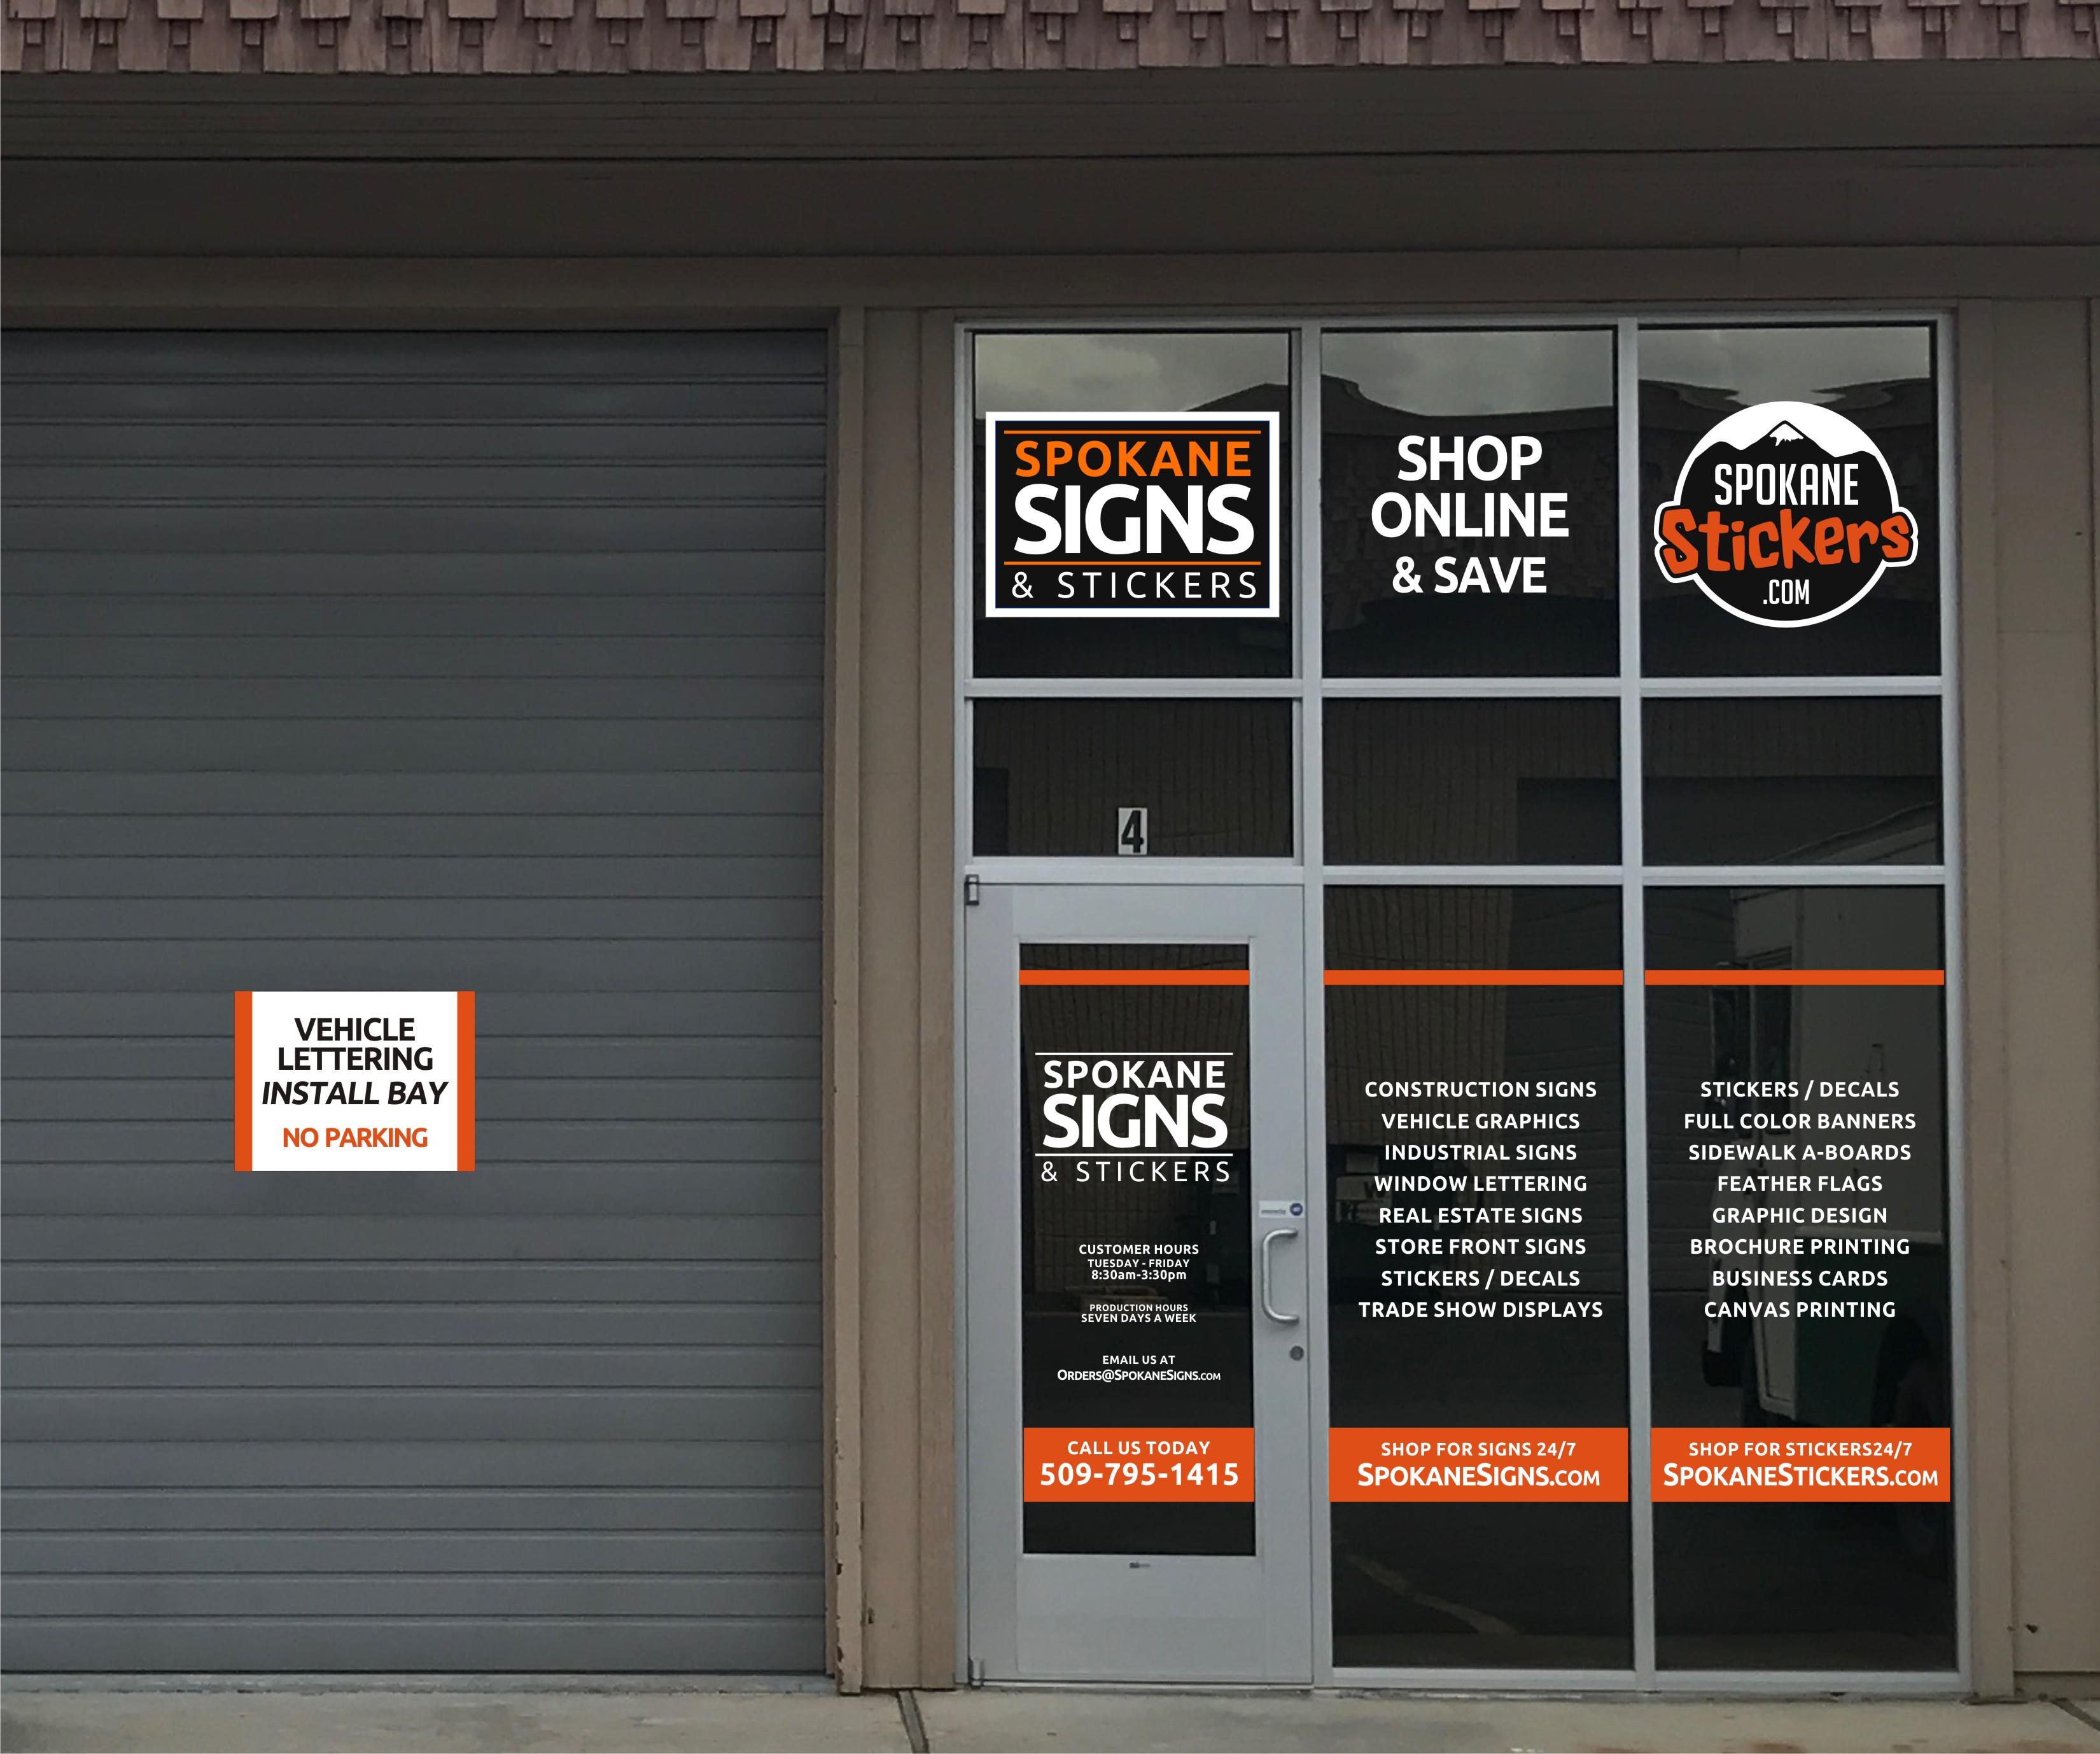 Spokane Signs & Stickers